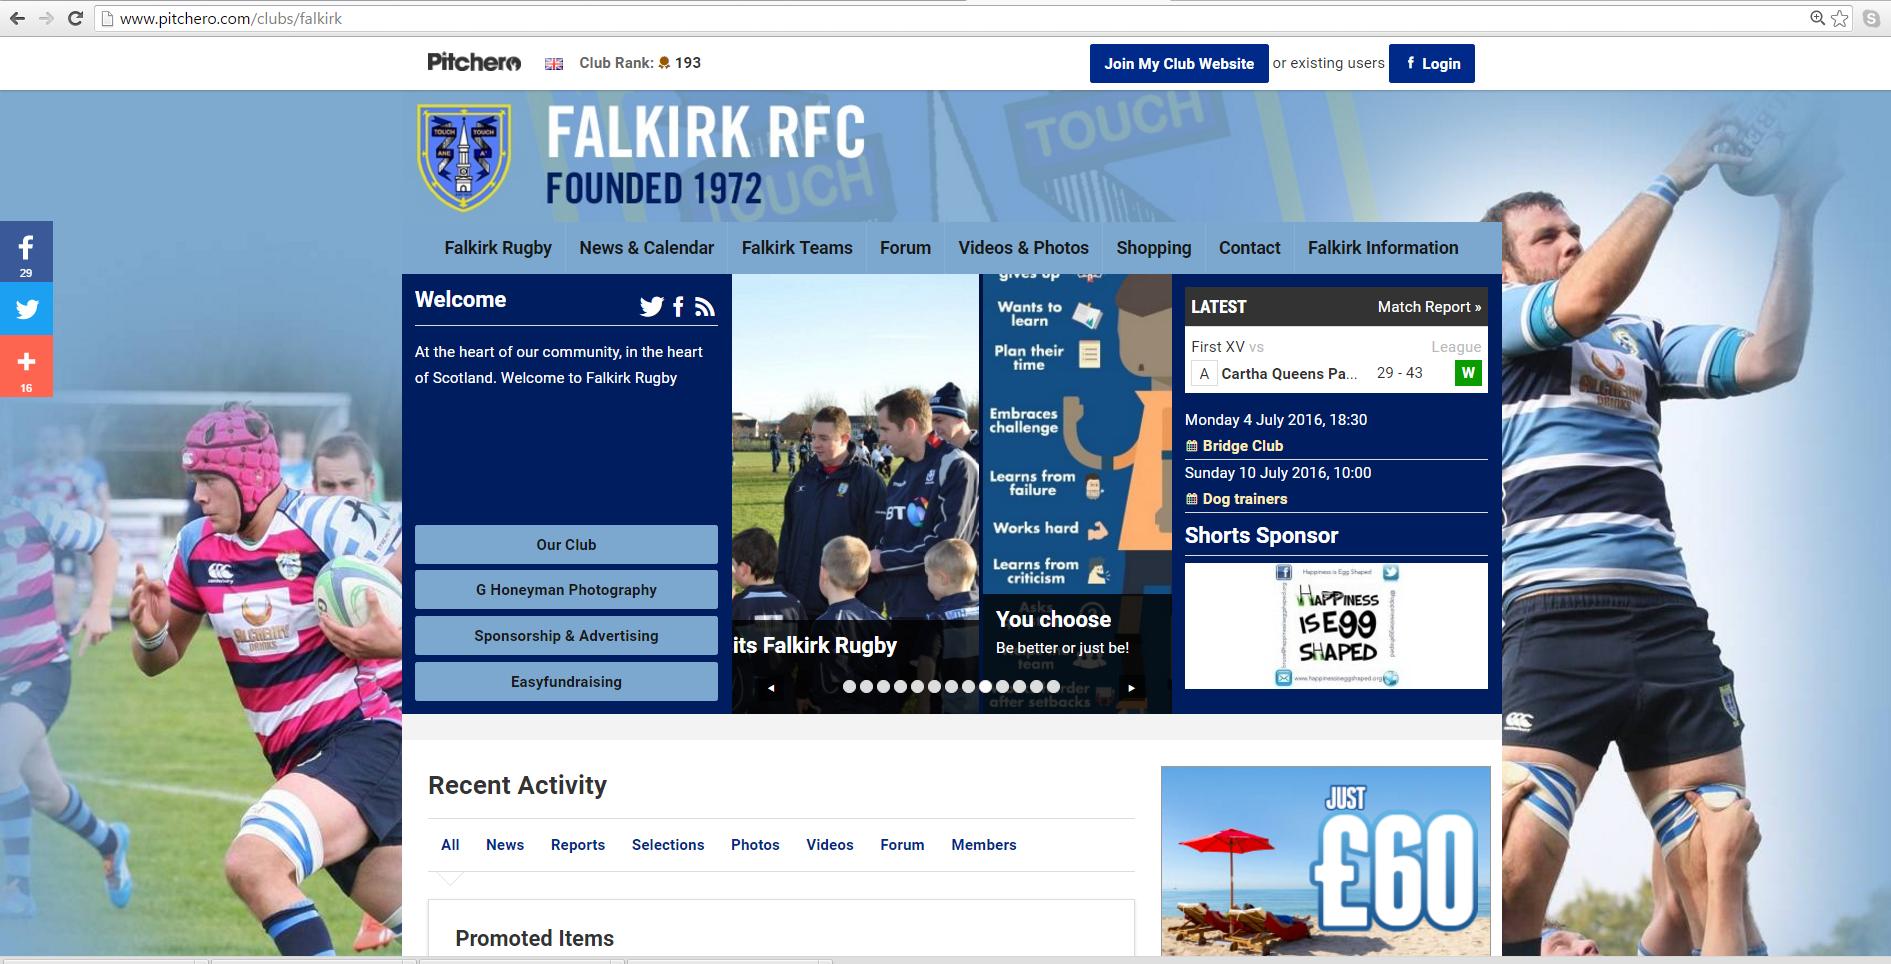 Falkirk RFC website